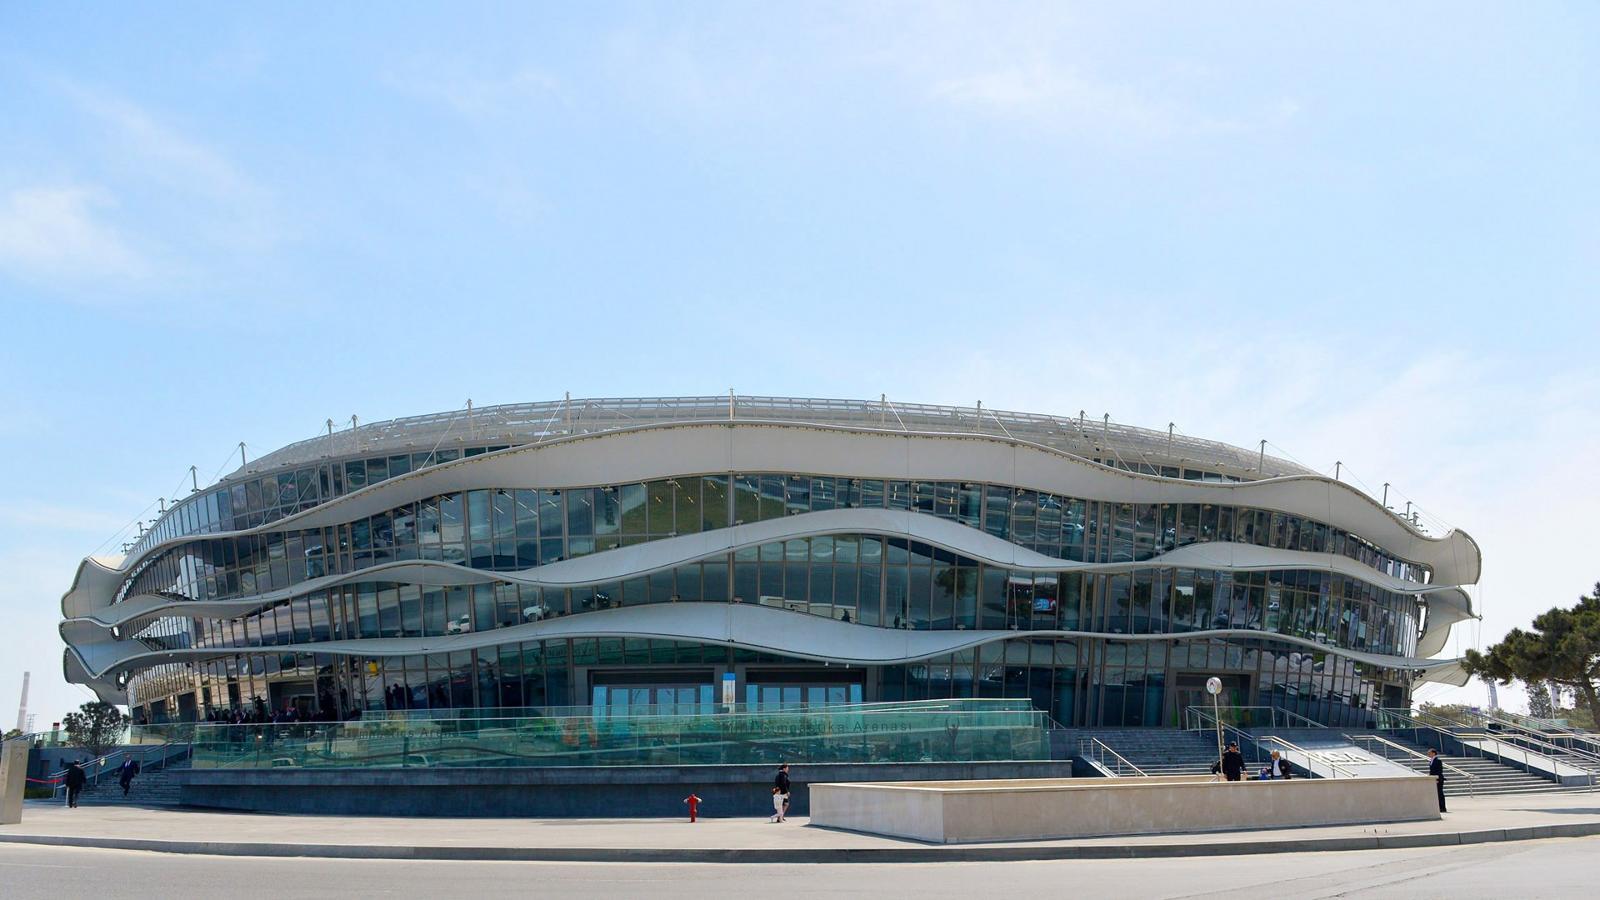 vجمهوری آذربایجان | Azerbaijan